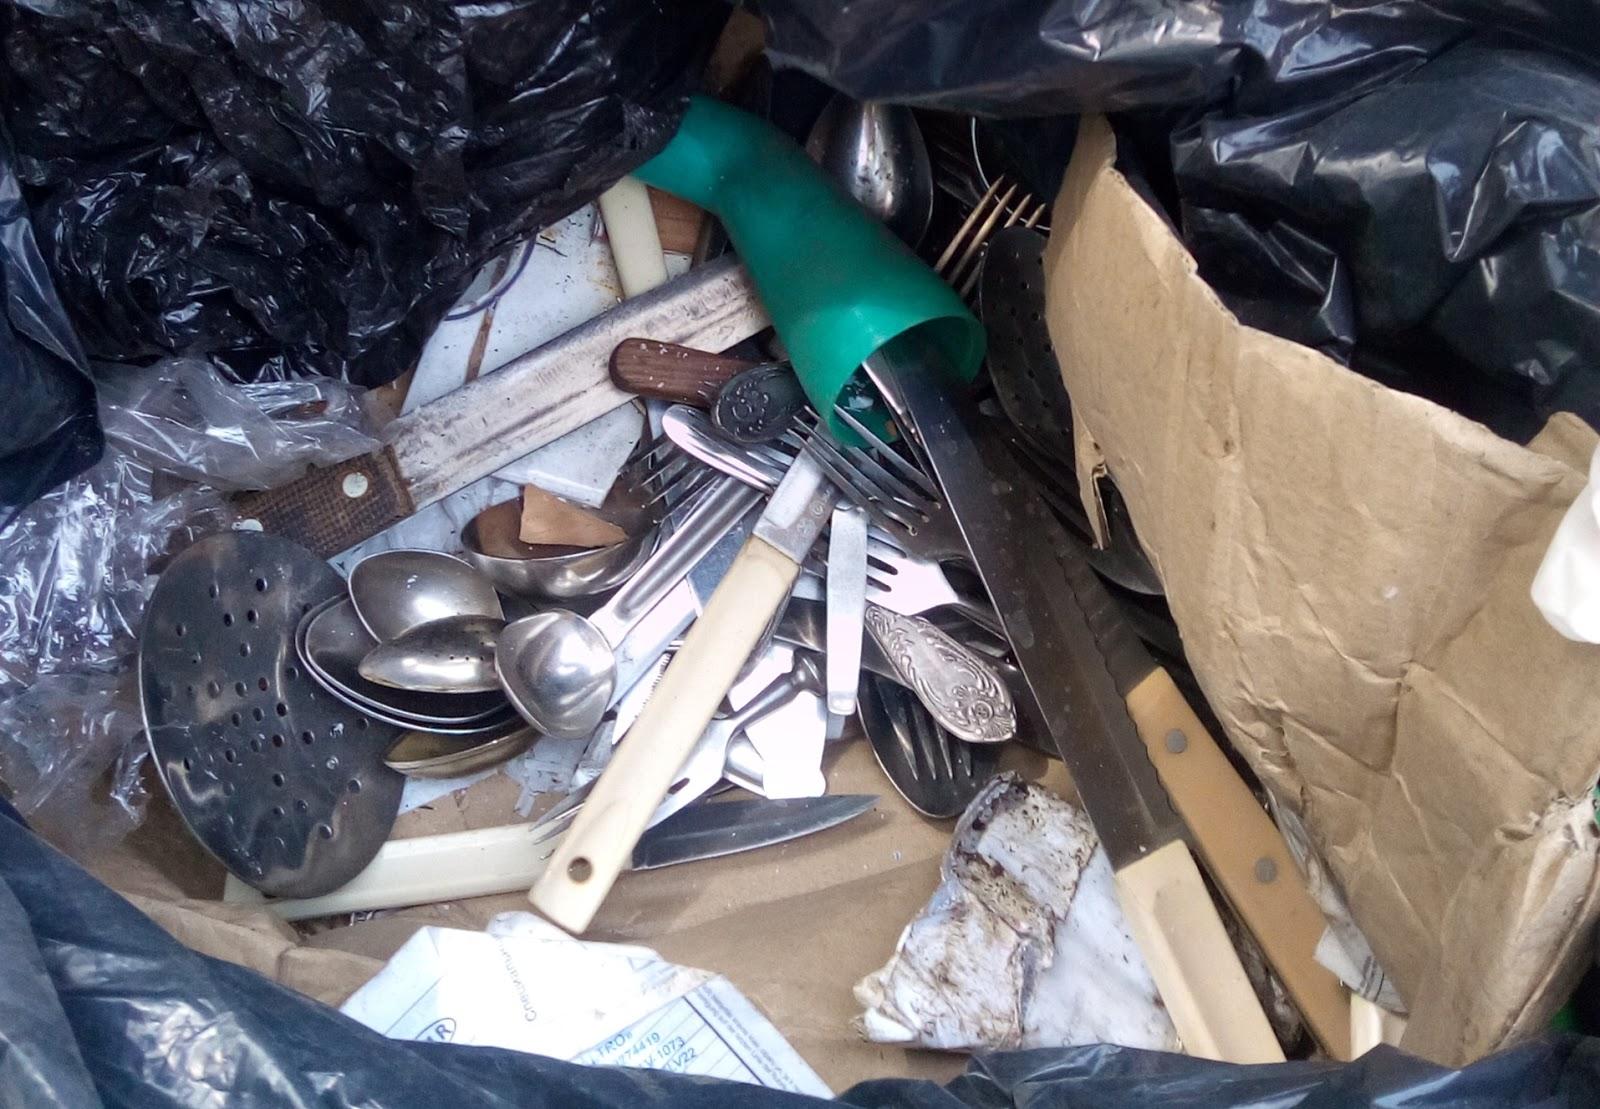 Galda piederumi atkritumos